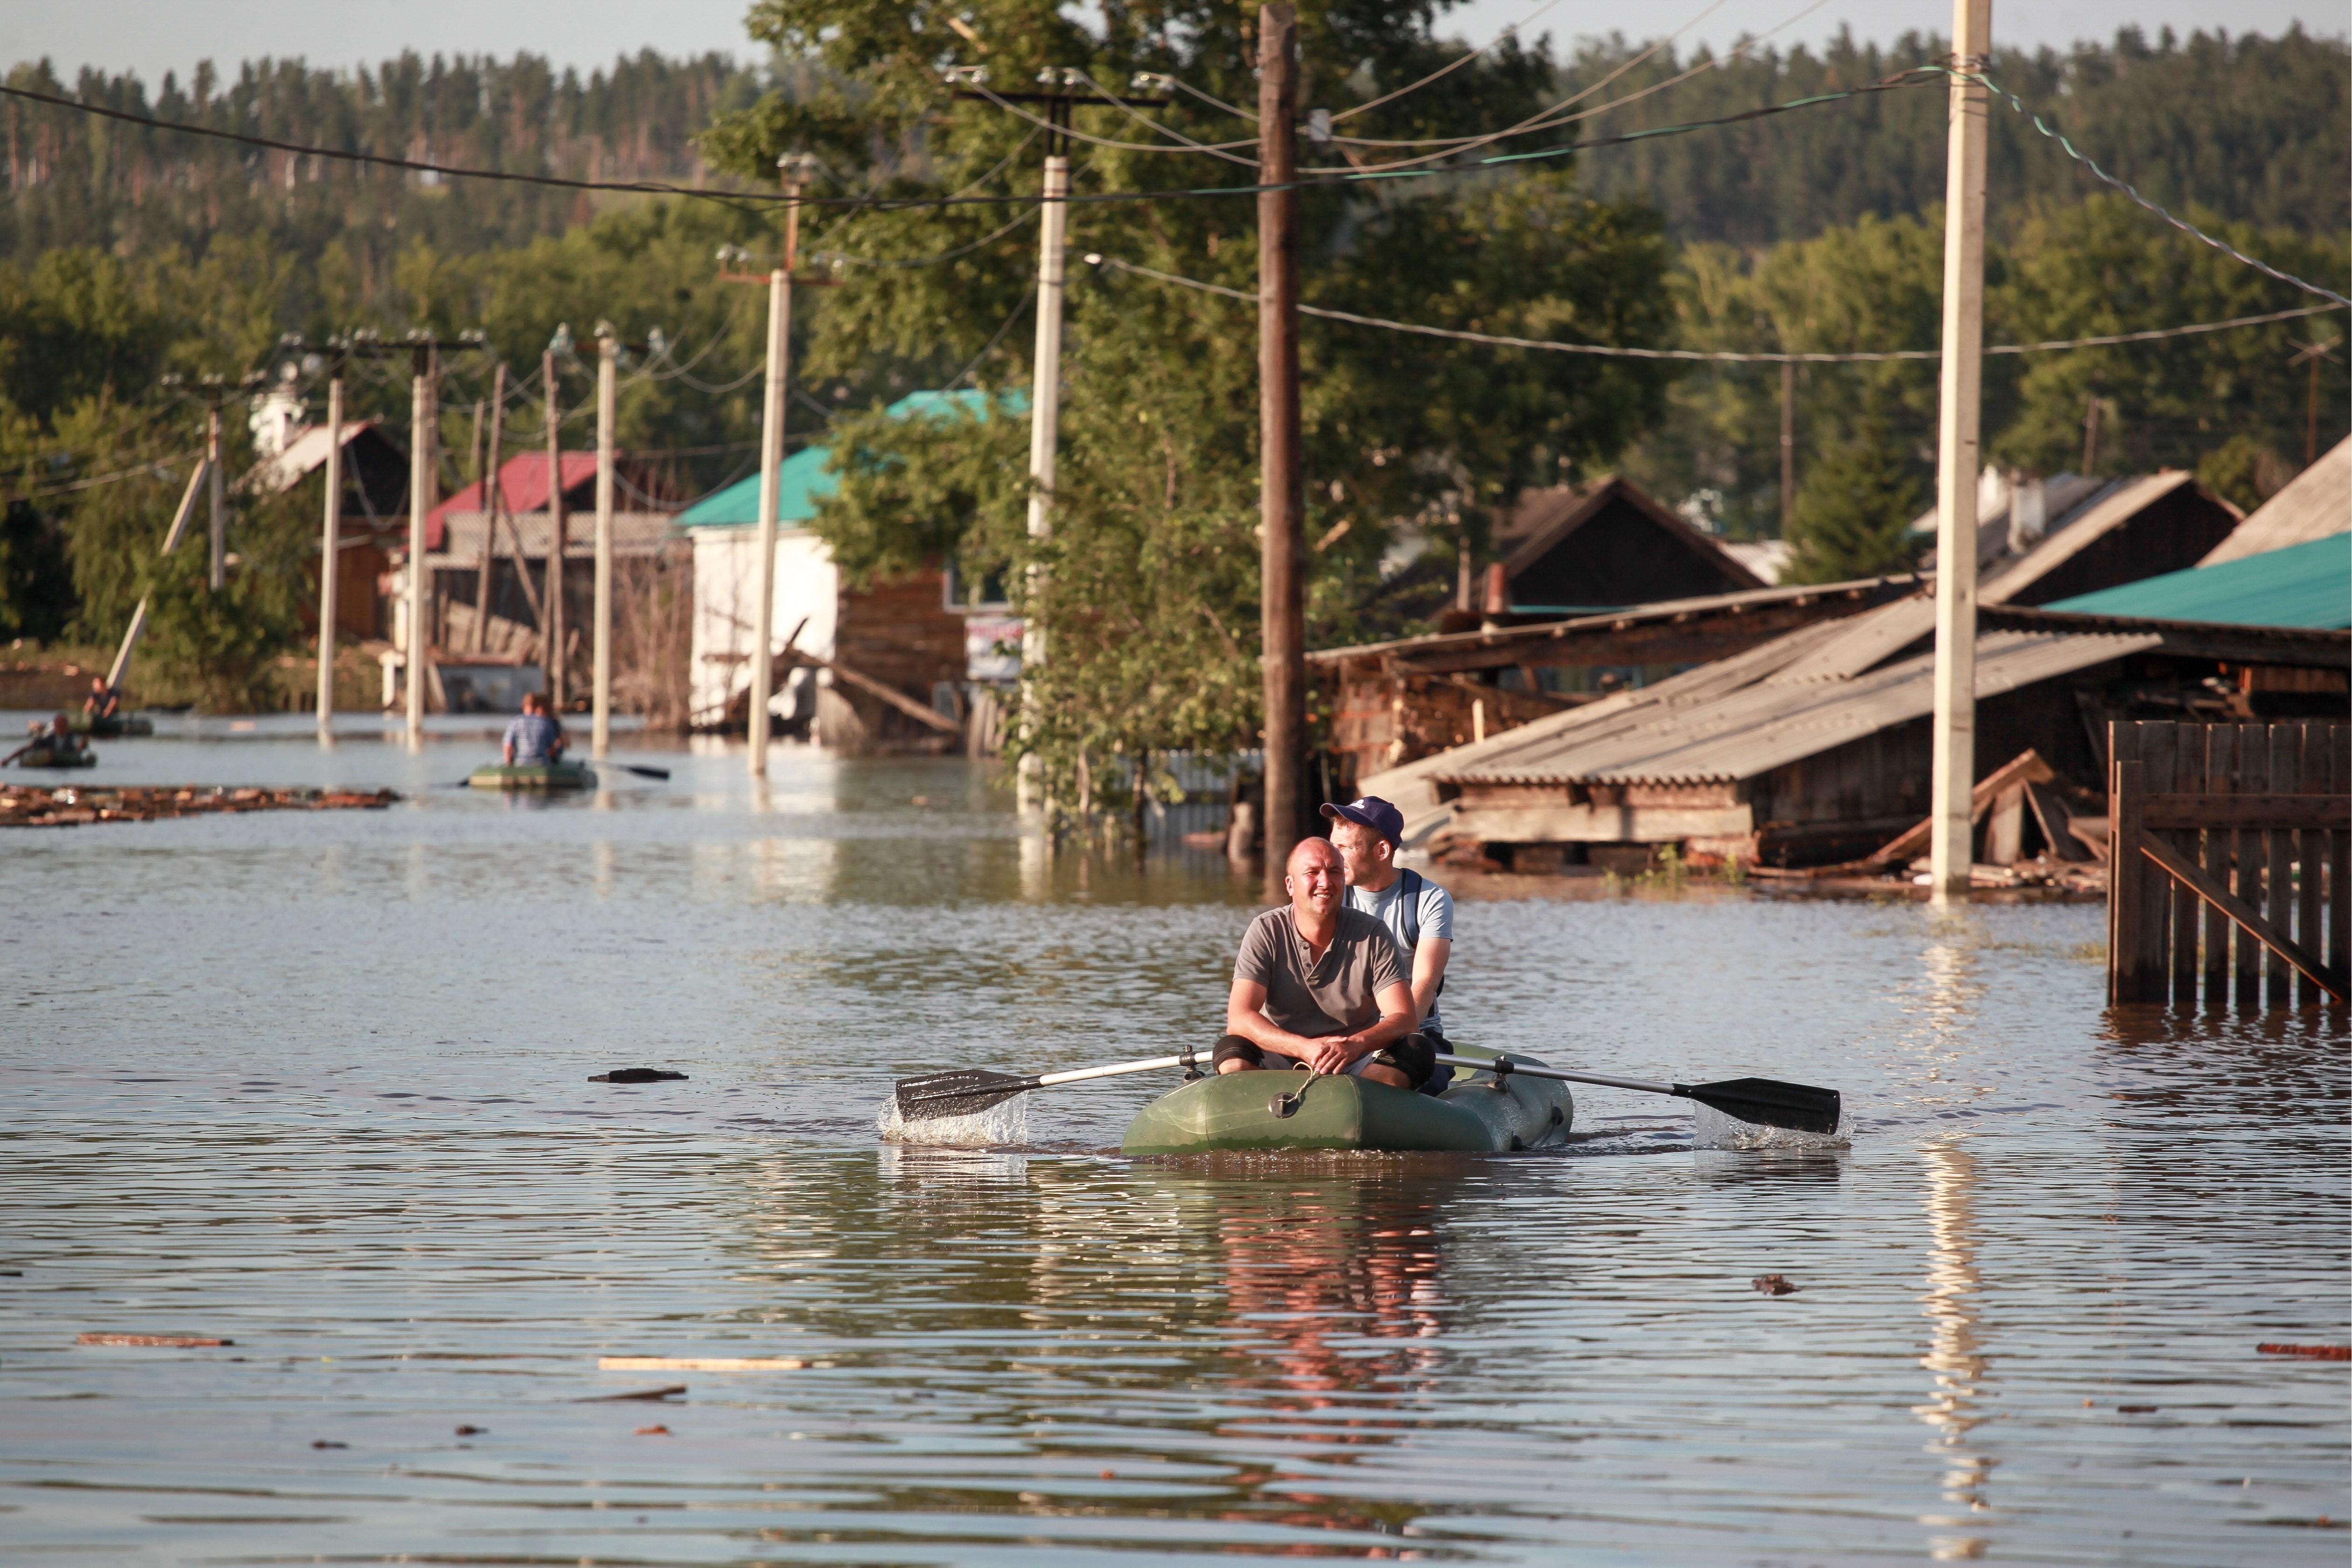 Последствия паводка в Иркутской области 2019 год